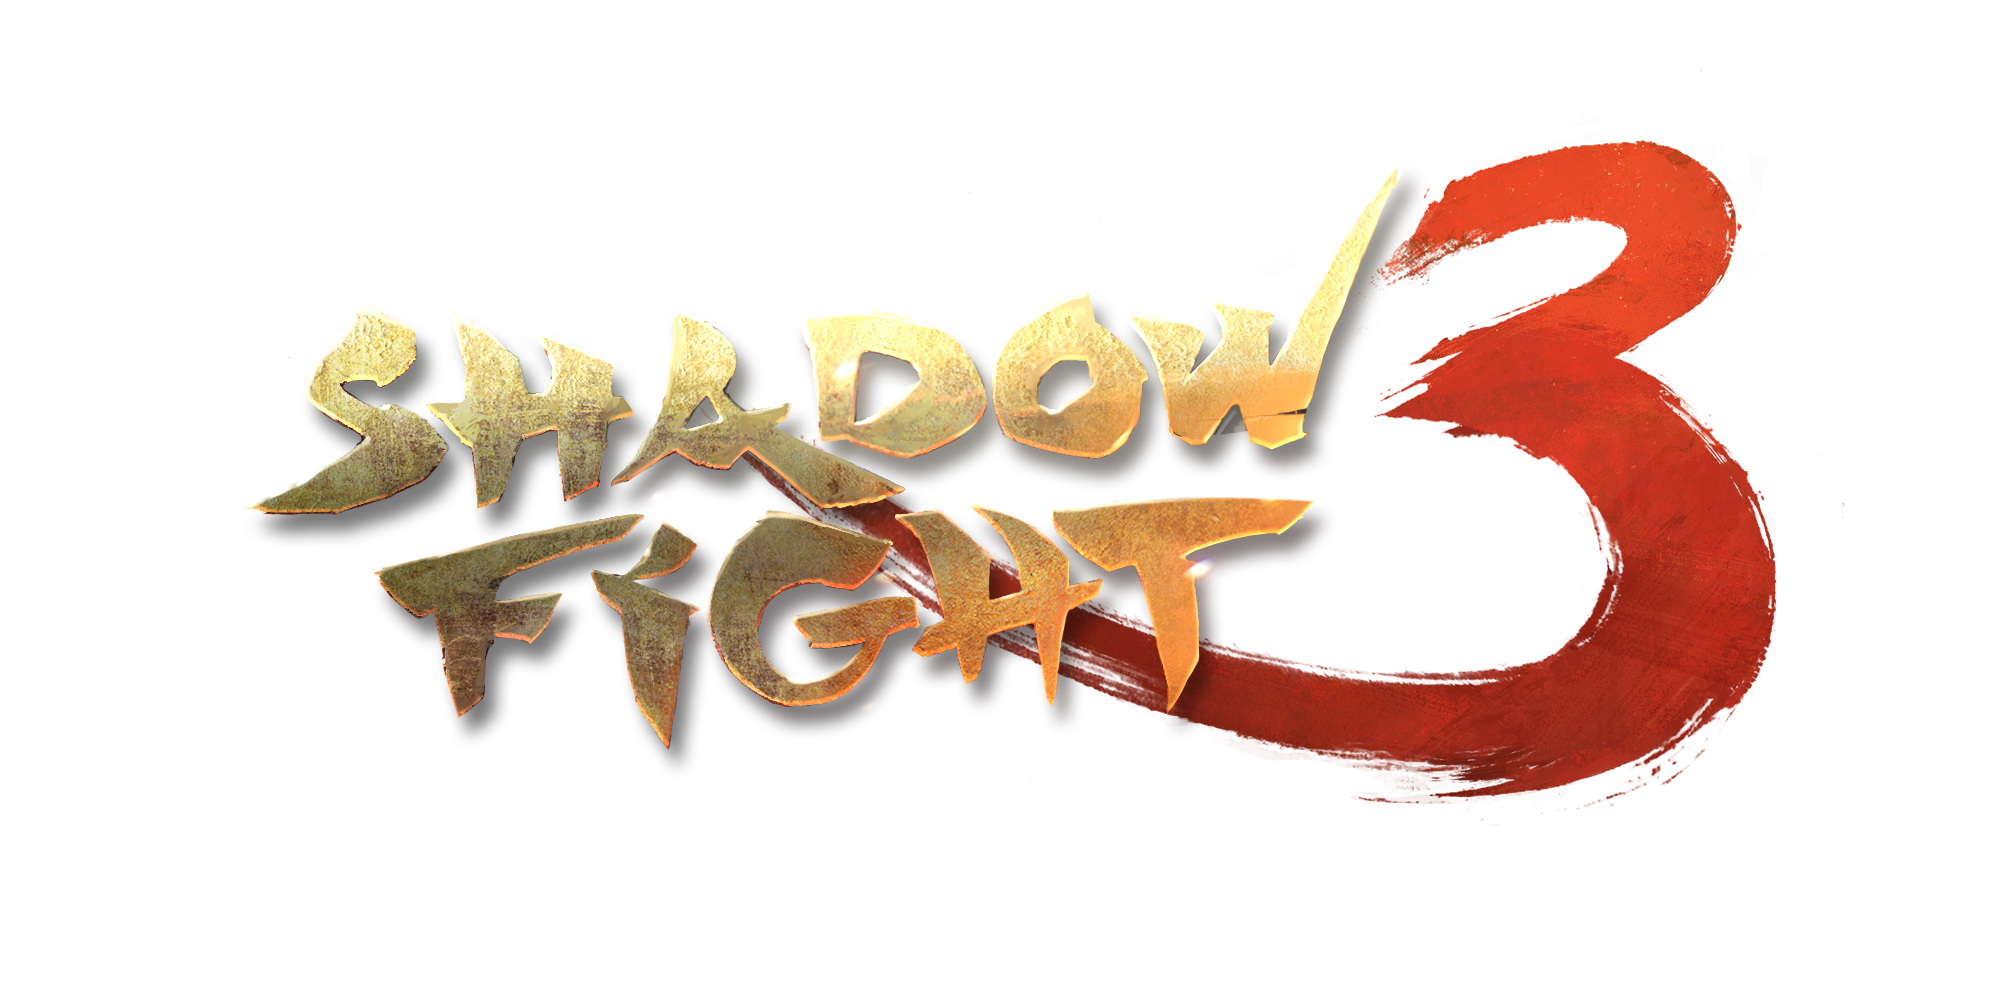 Shadow Fight 3・Tesztlabor